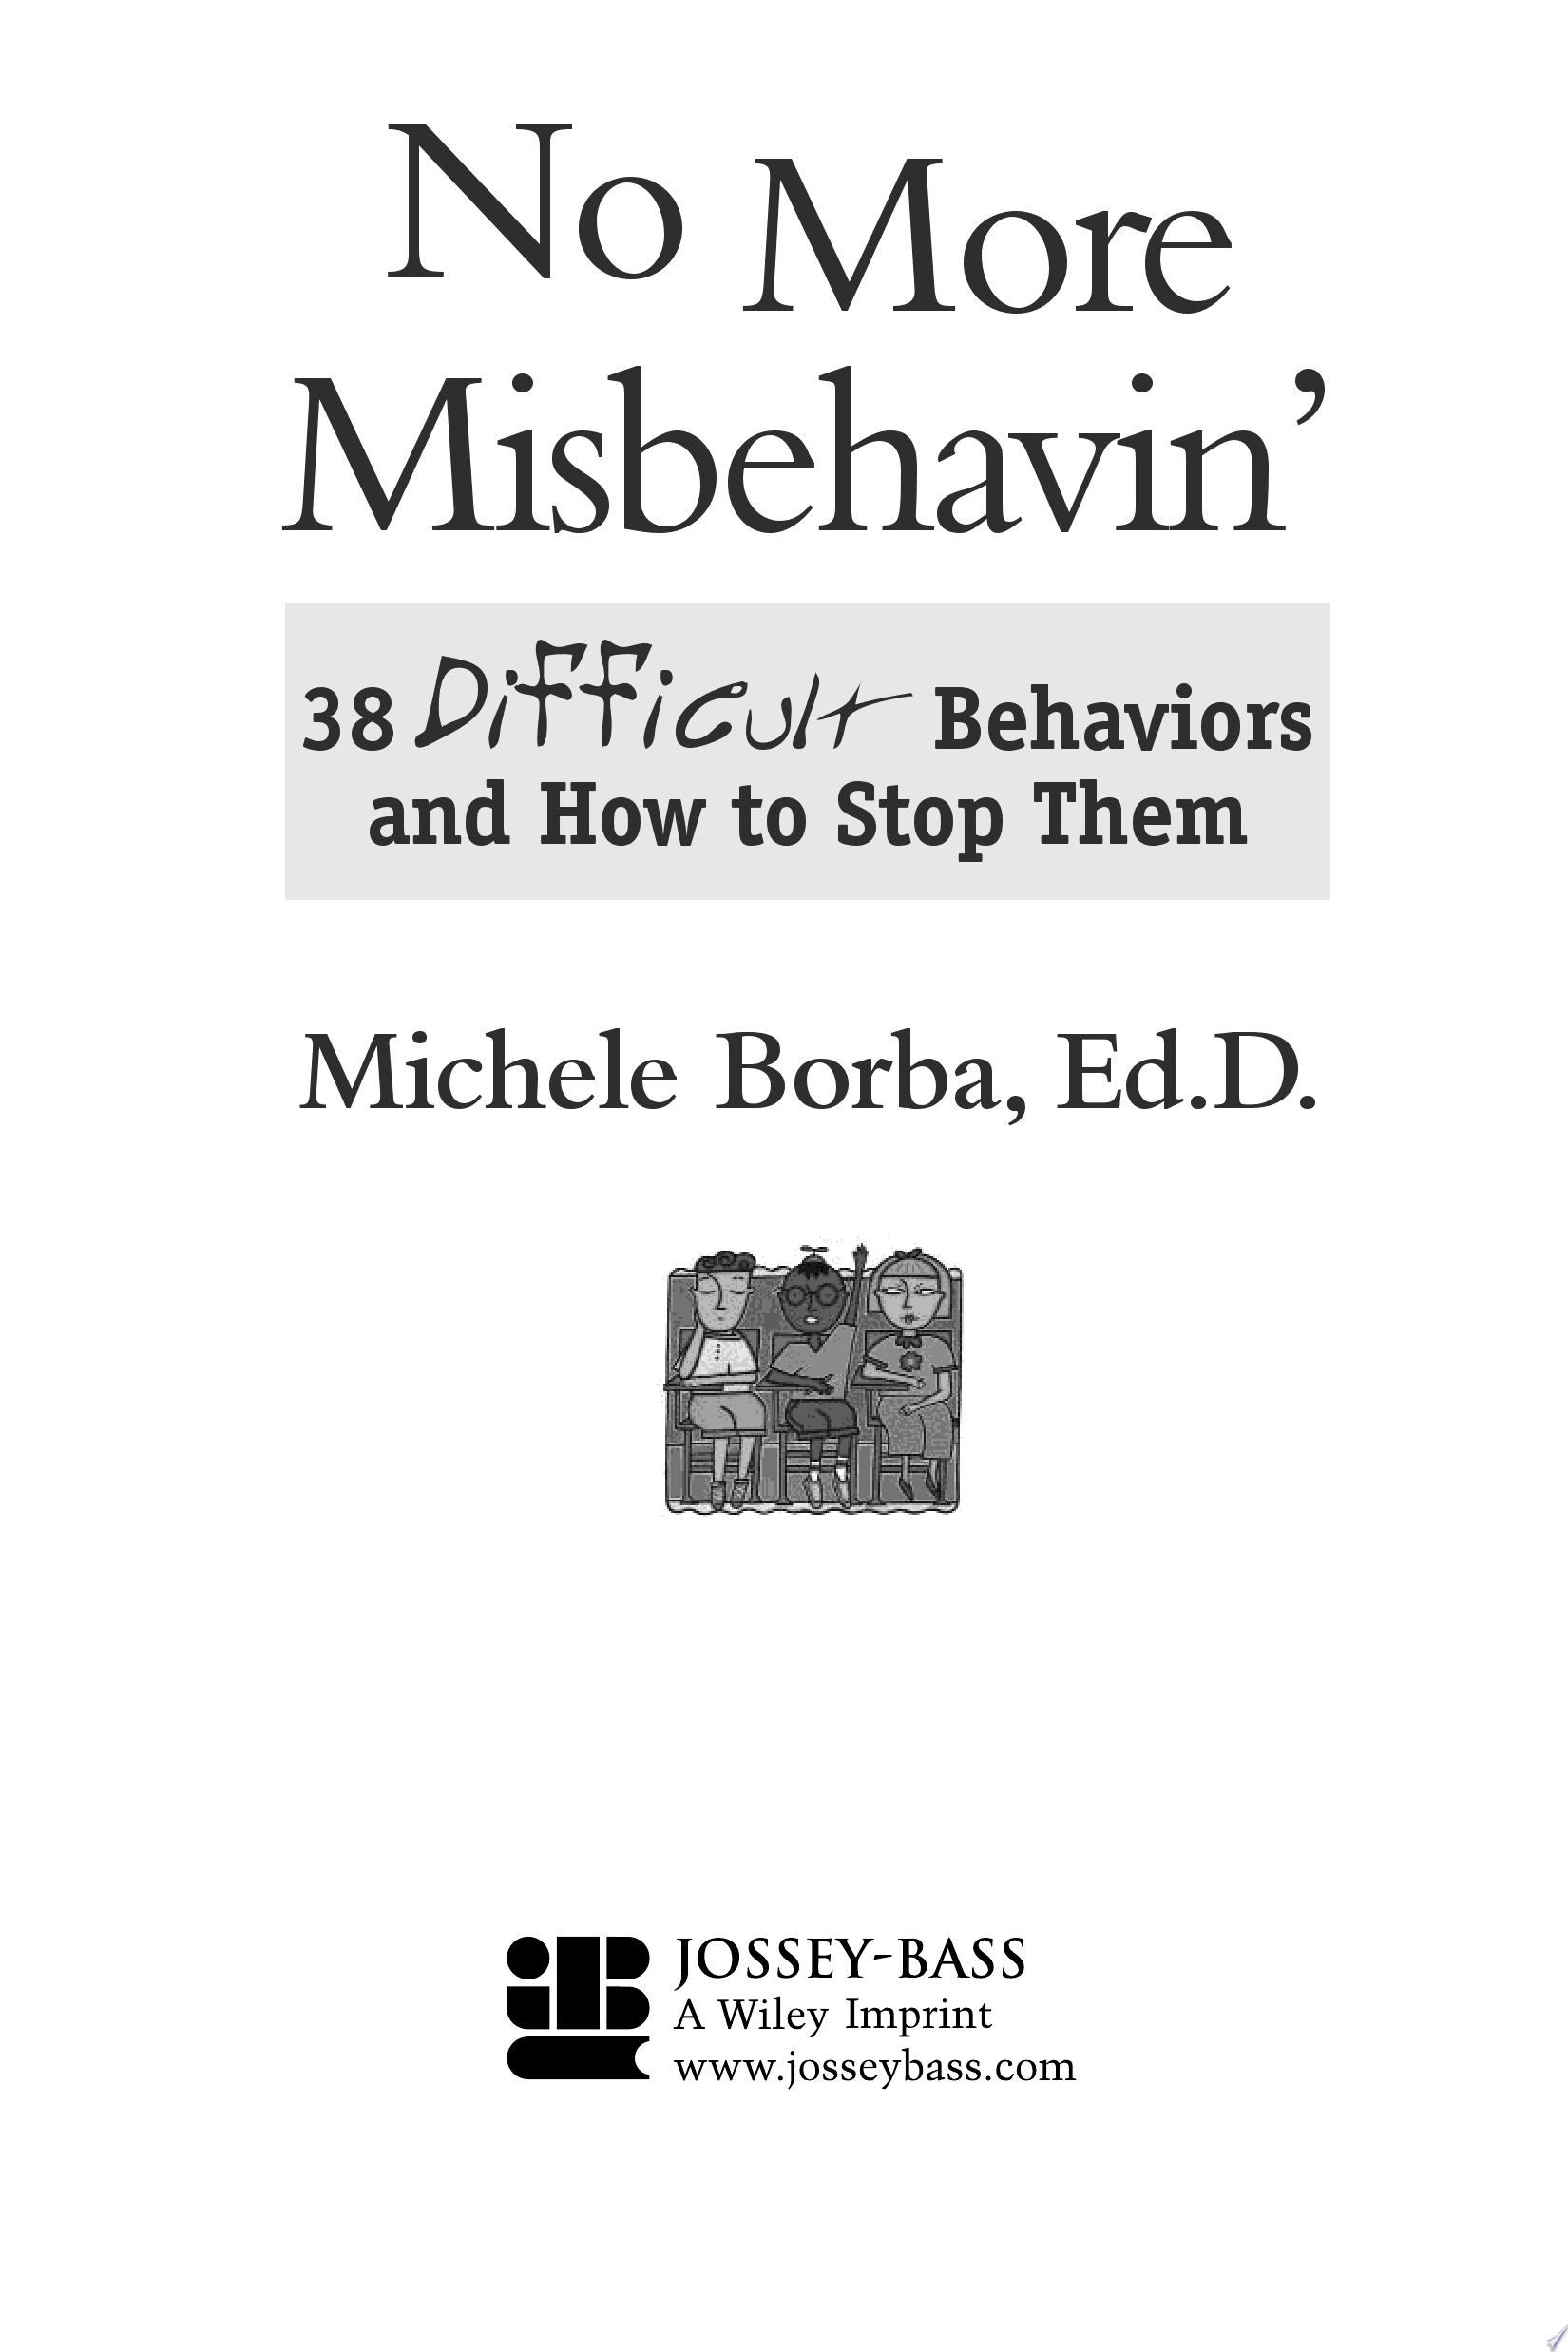 No More Misbehavin